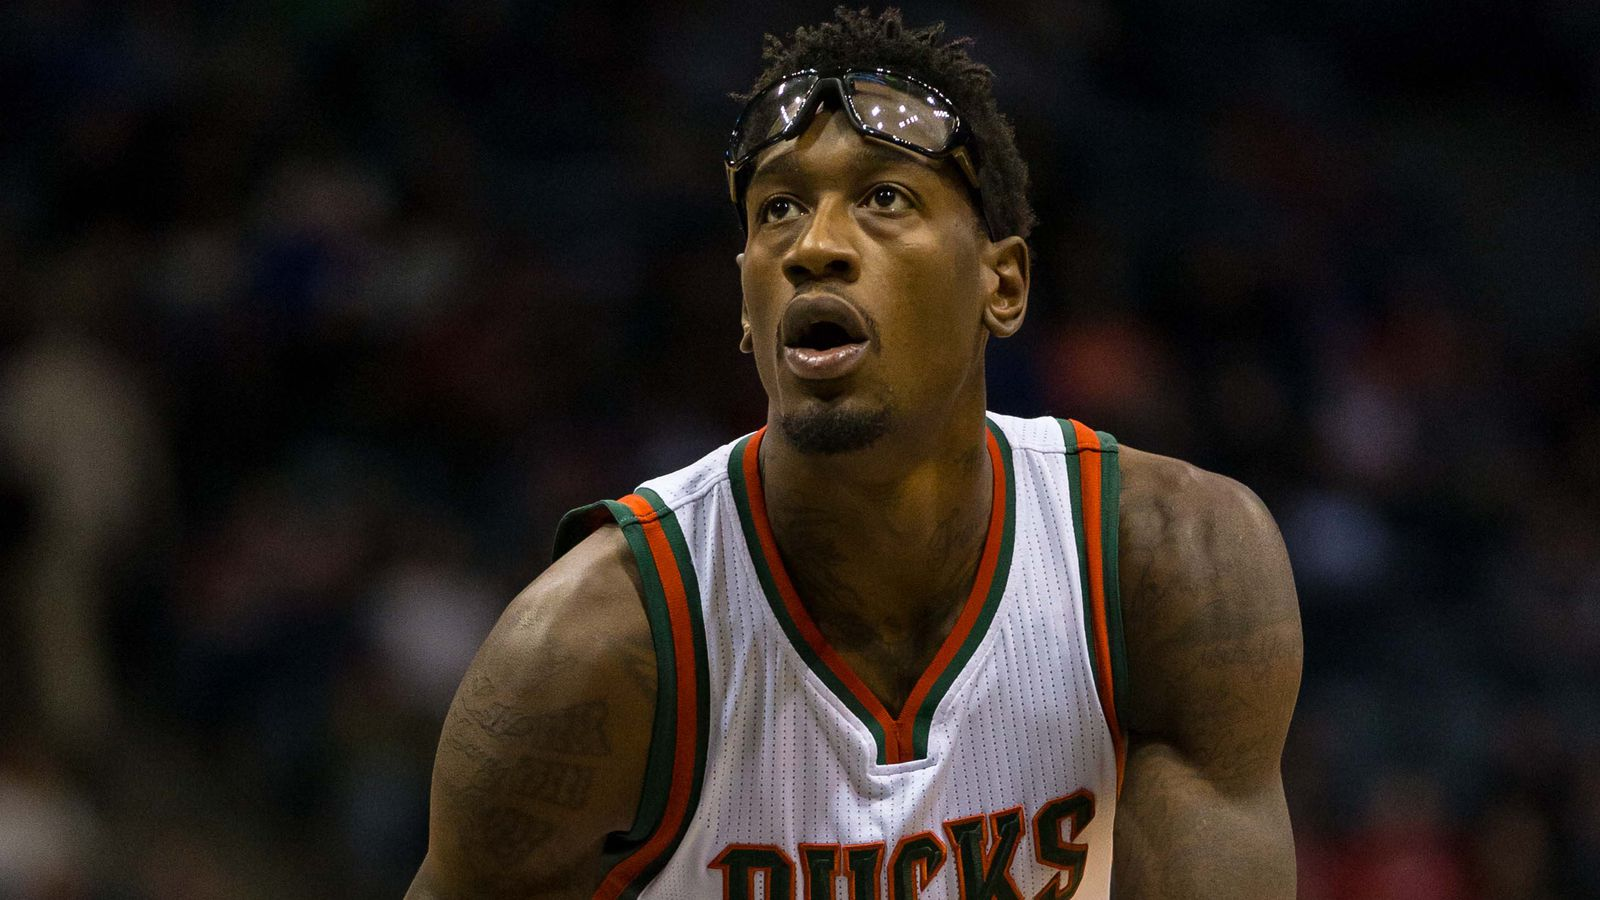 Should NBA Players Be Able to Smoke Marijuana?